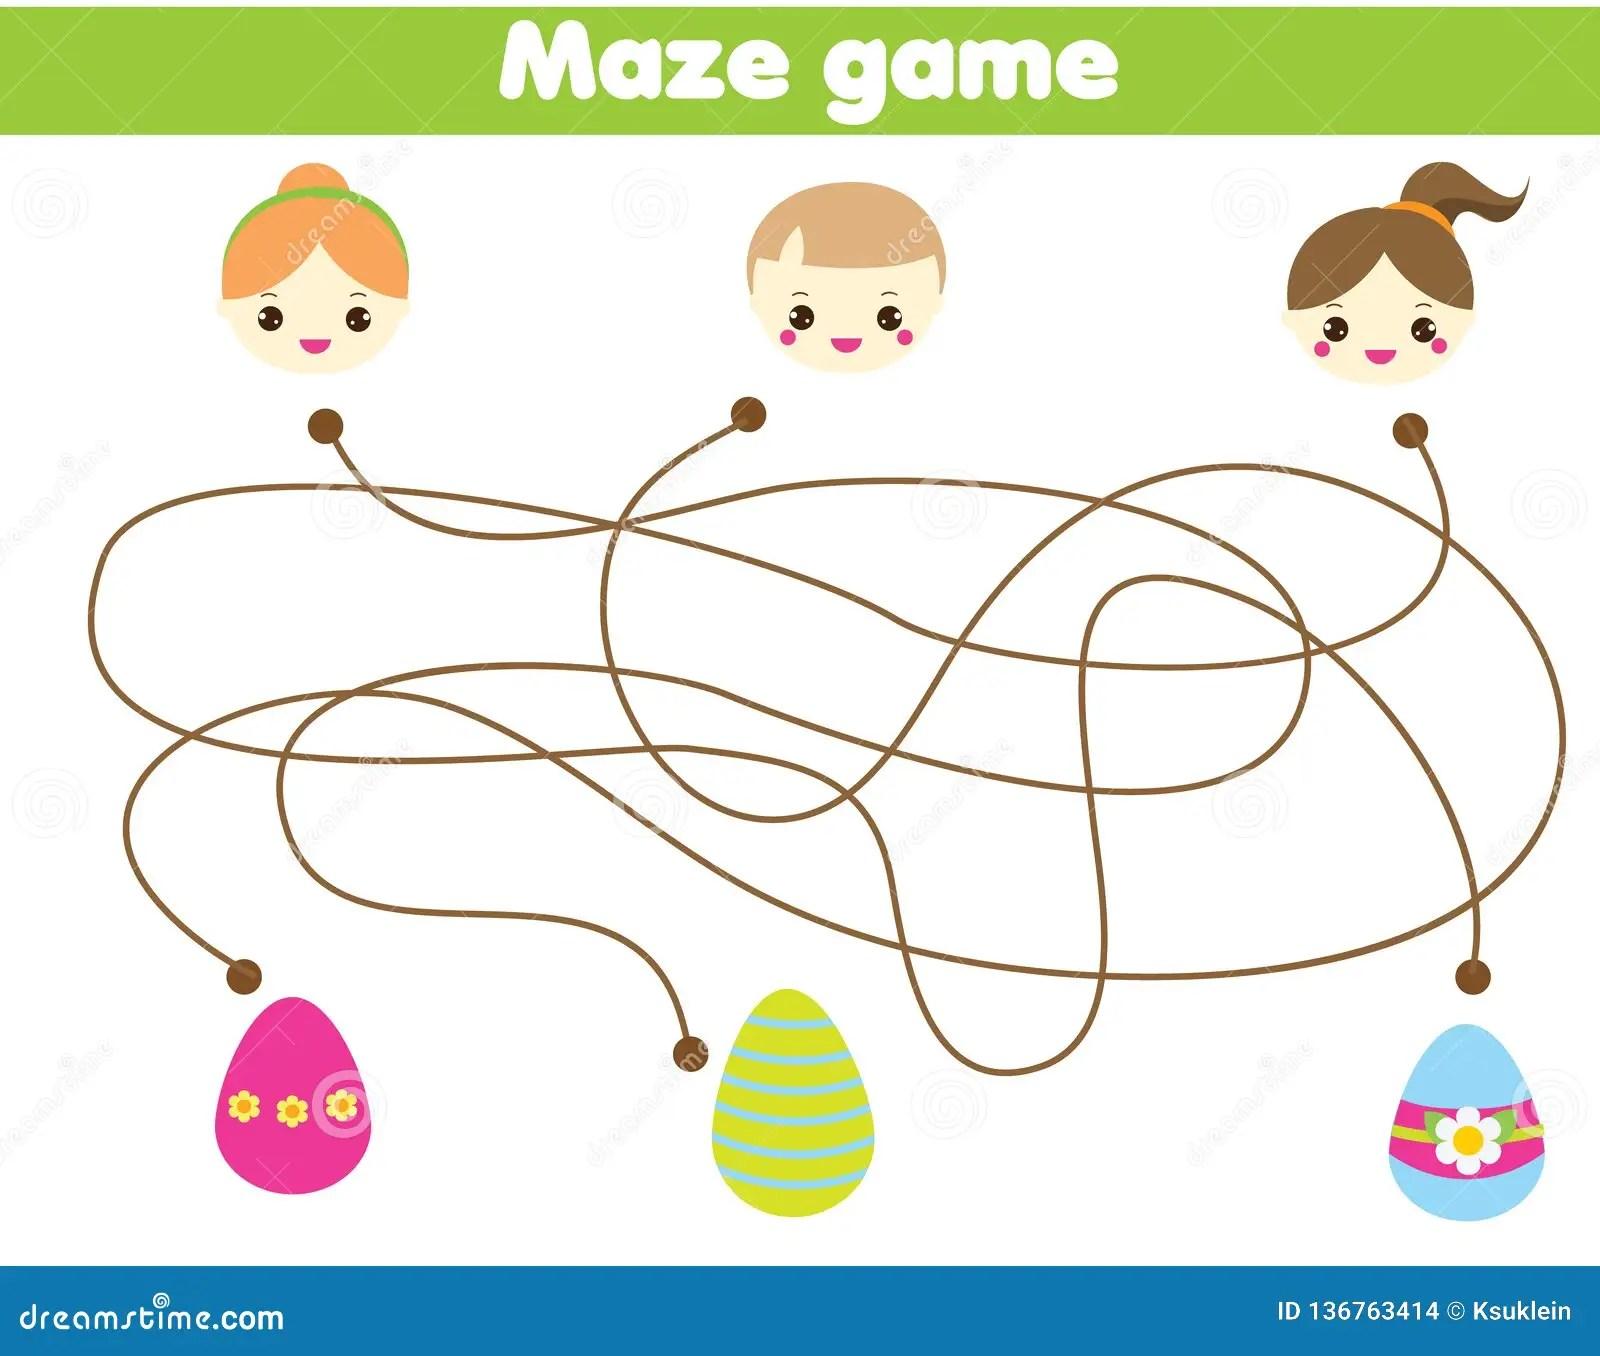 Maze Game For Children Easter Egg Hunt Activity Help